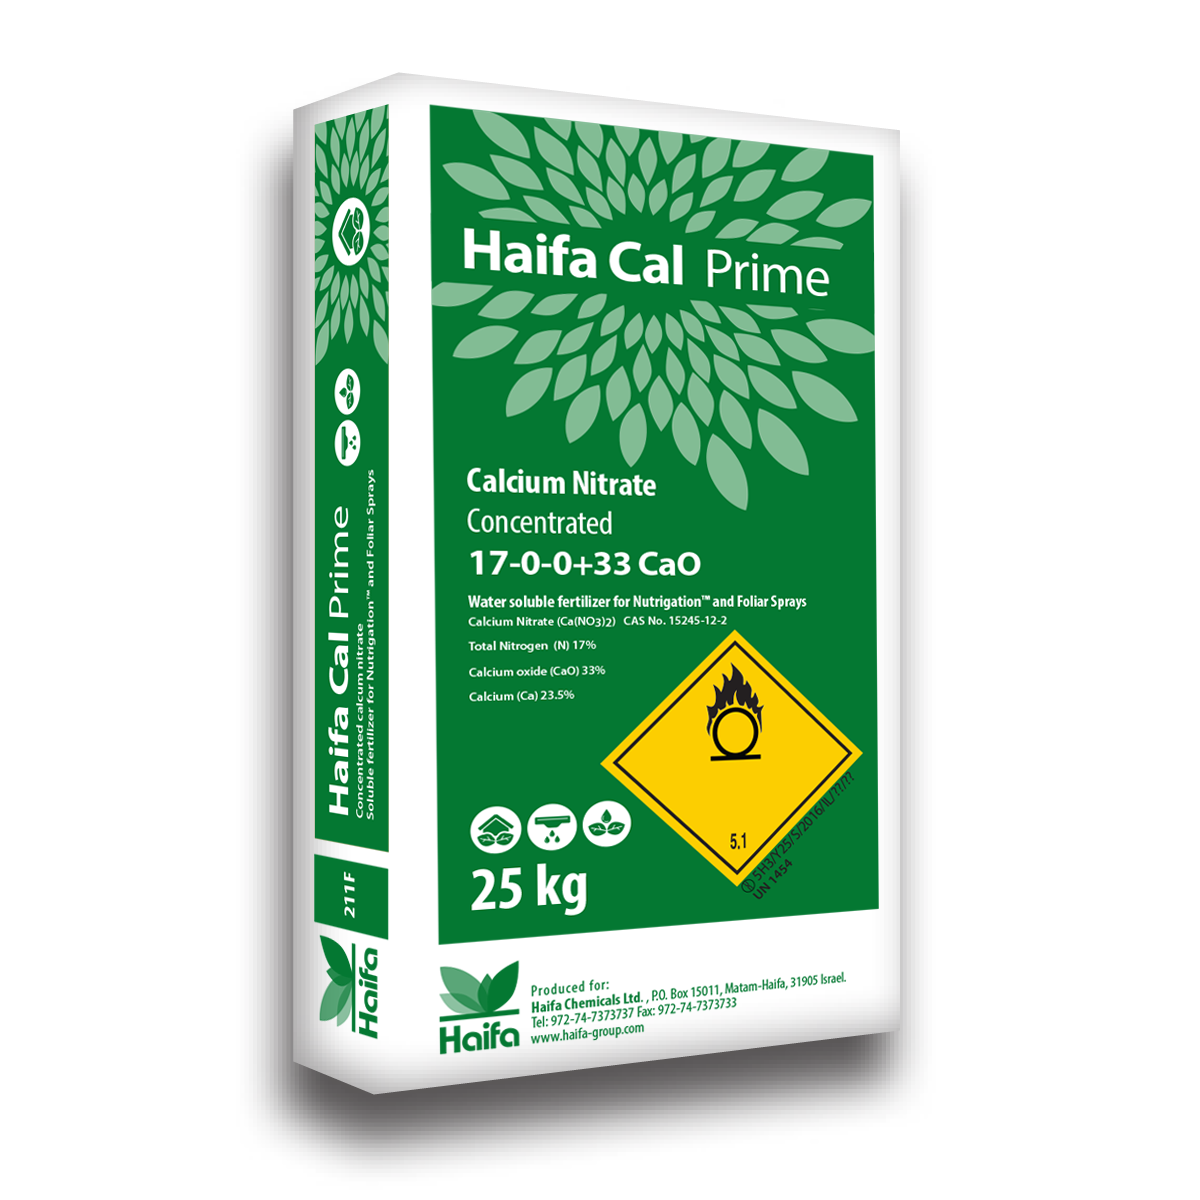 Haifa Cal - Calcium Nitrate Fertilizer   Haifa products